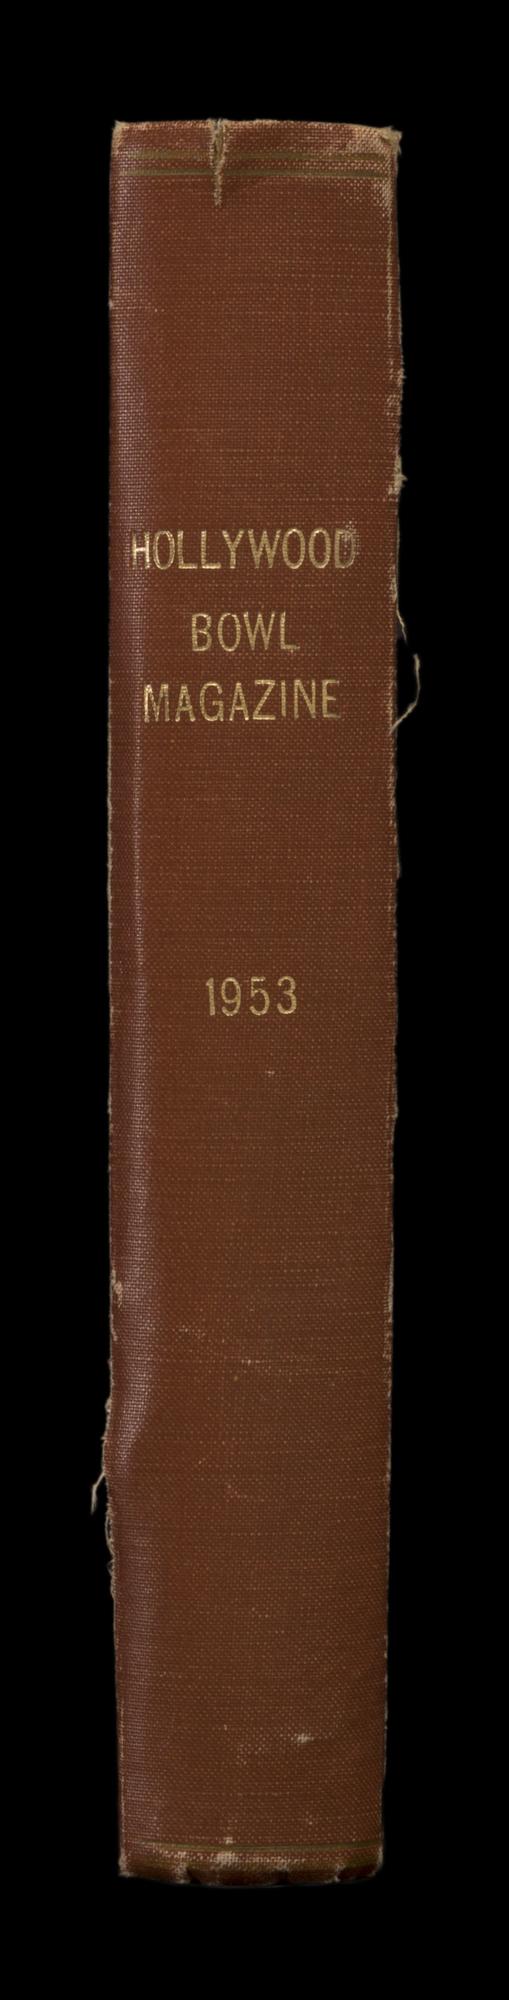 HB_ProgramBook_Spine_1953.jpg